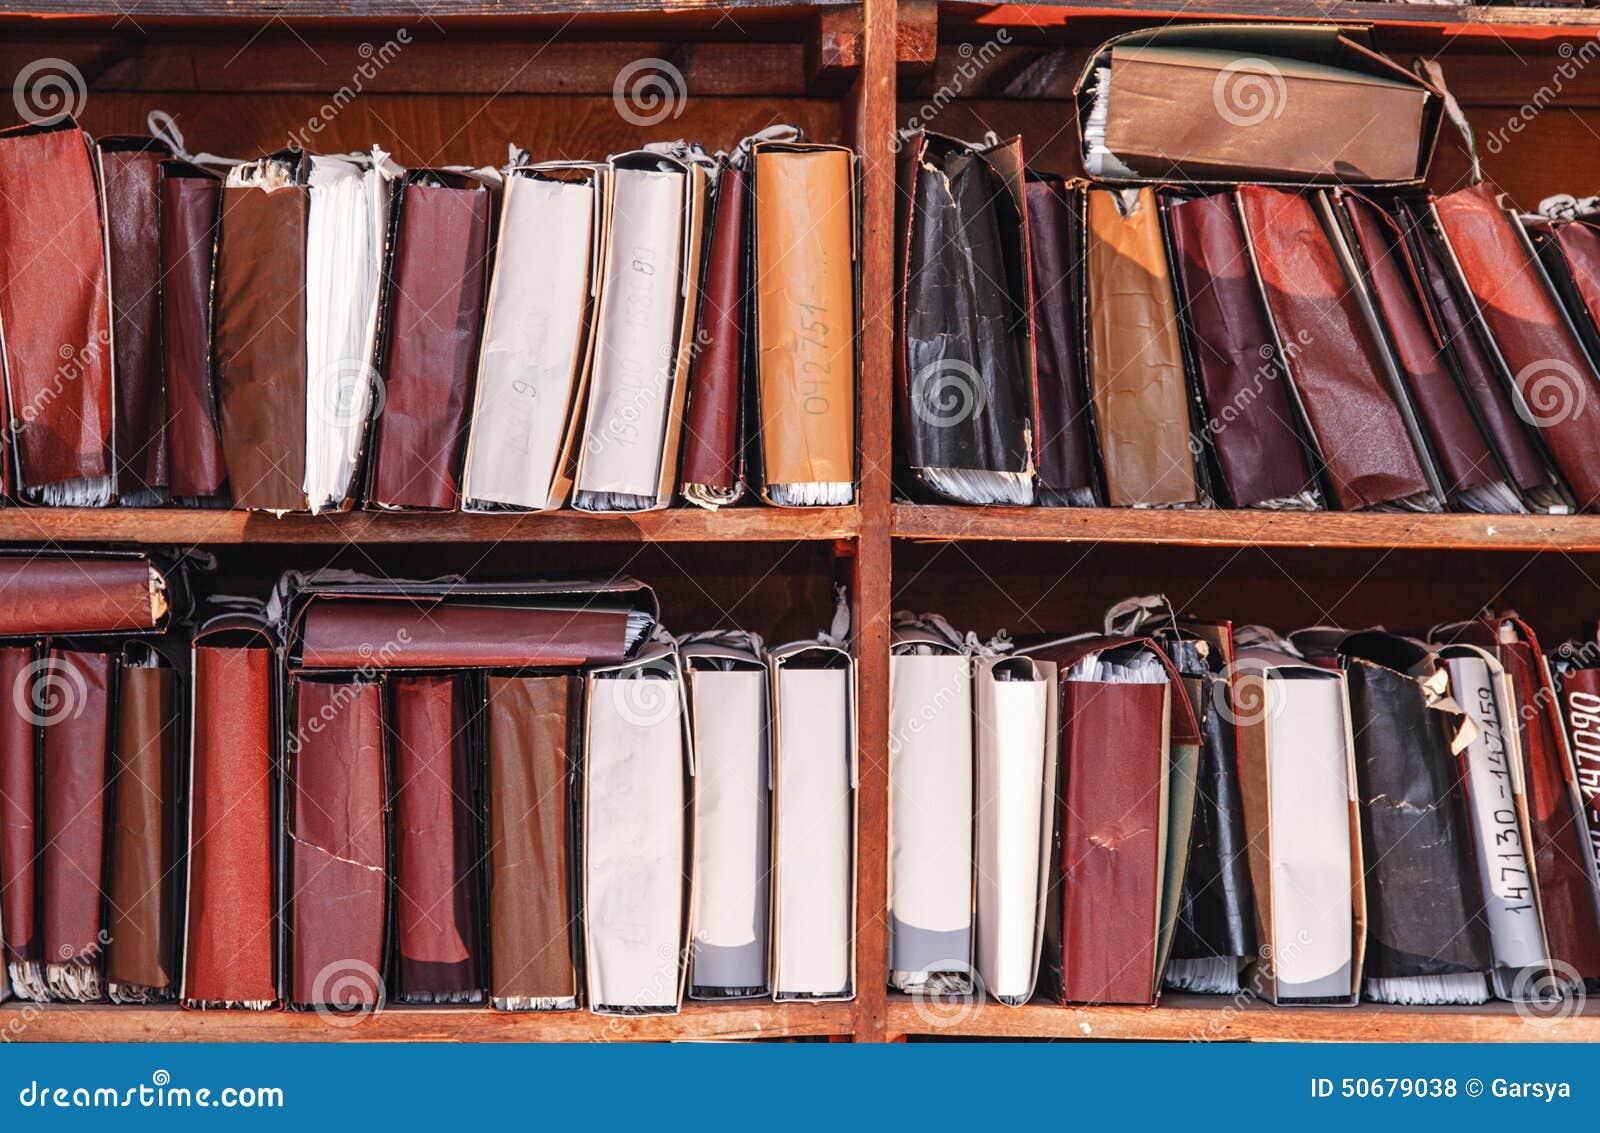 Download 在档案里堆积的纸张文件 库存照片. 图片 包括有 保留, 办公室, 专门技术, 工作, 架子, 组织, 学习 - 50679038